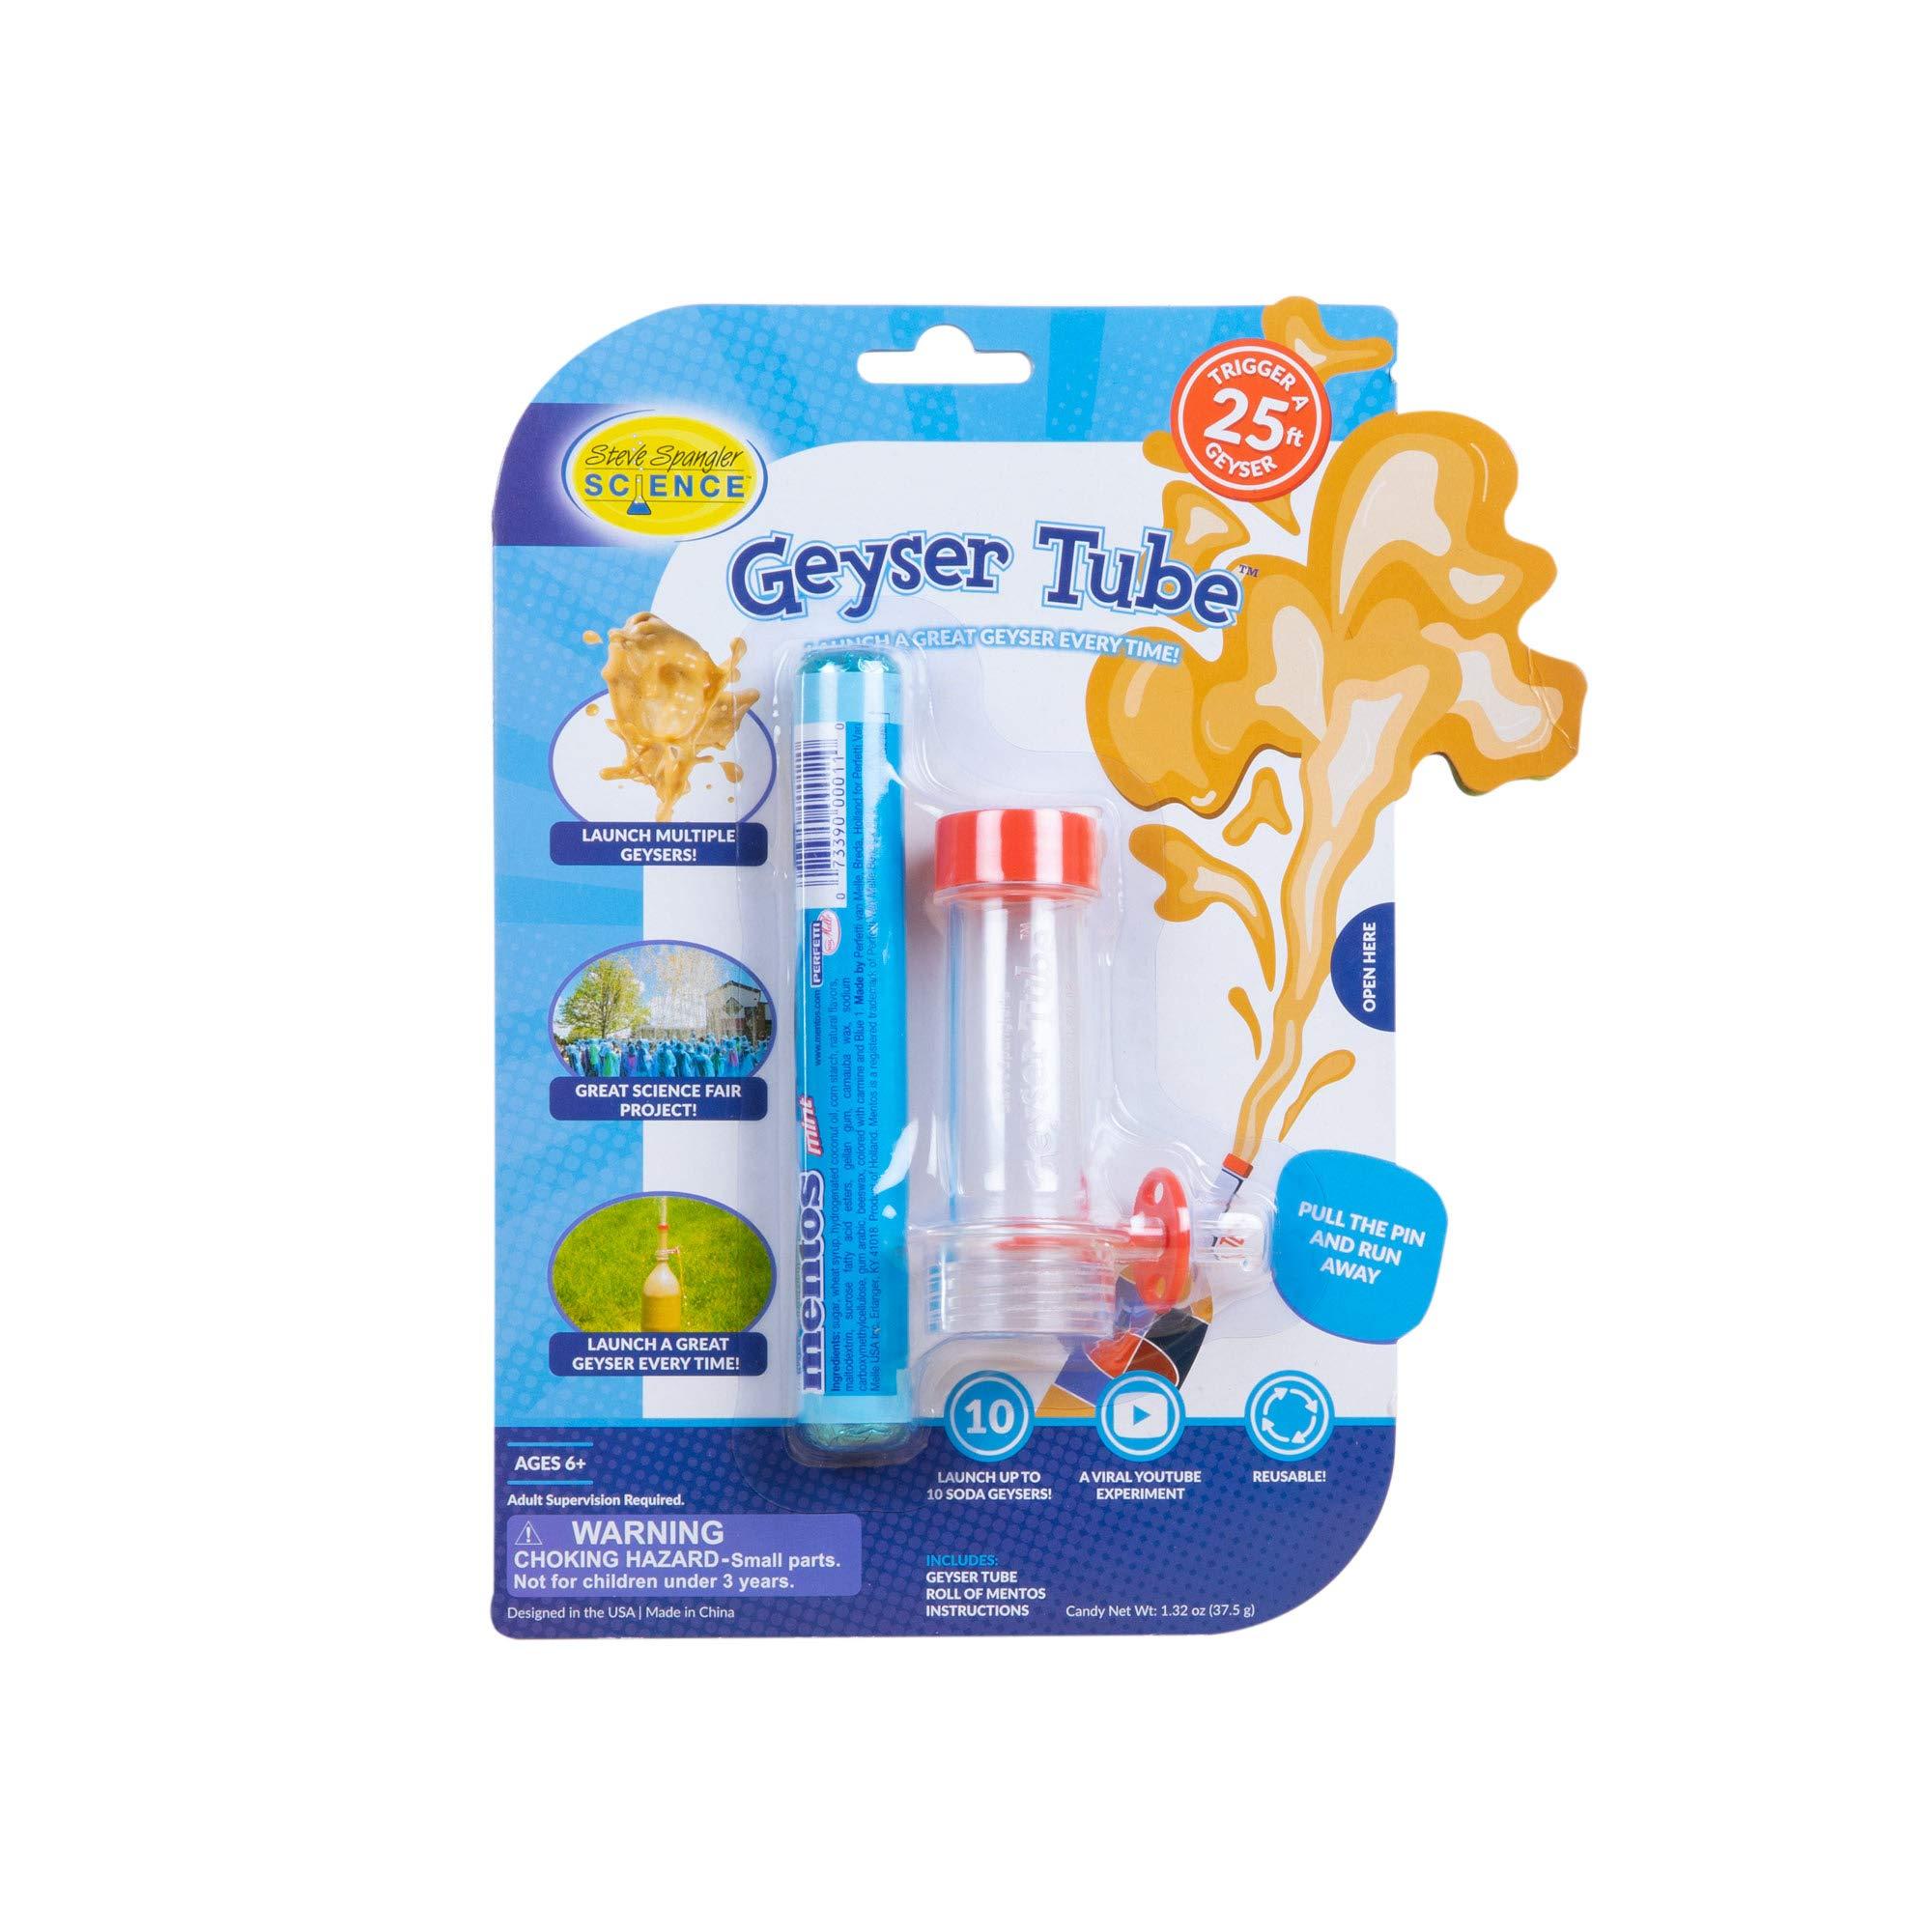 Steve Spangler Science - WGEY-505 Geyser Tube Experiment, 1 Tube – Science Experiment for Kids, Turns Soda Bottle and Mentos Candies into Erupting Geyser